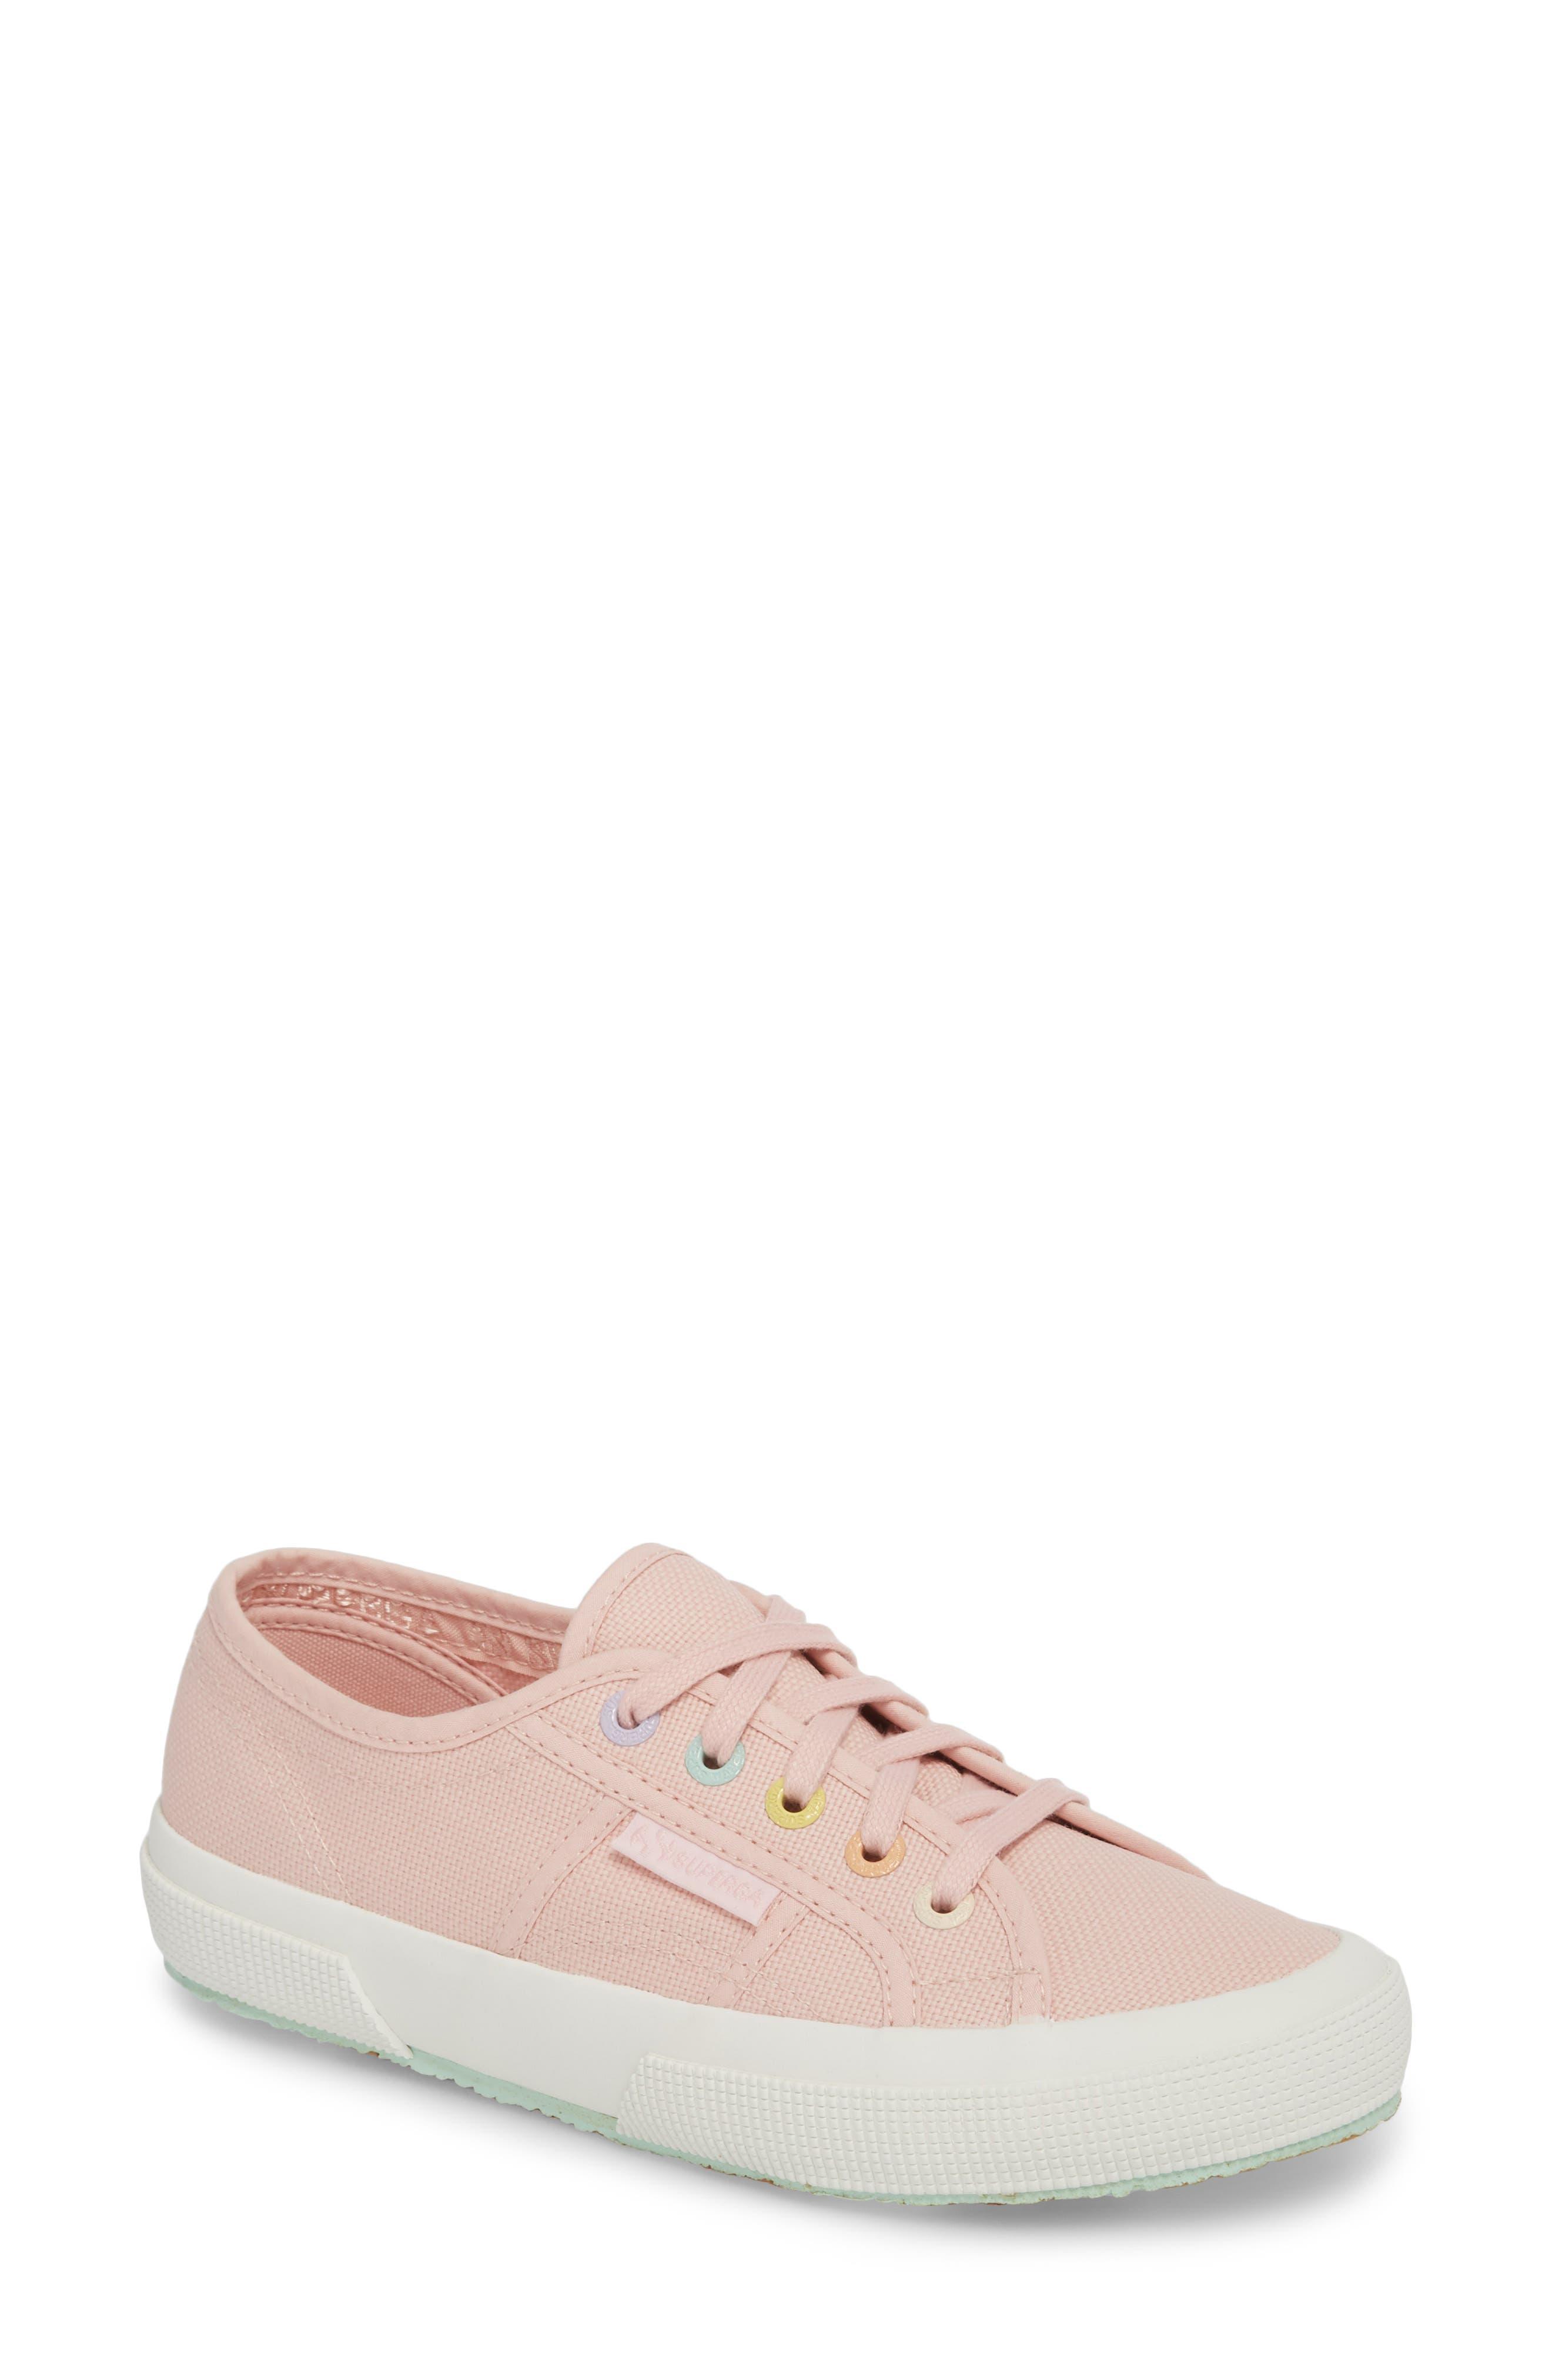 2750 Rainbow Sneaker,                         Main,                         color, Light Pink